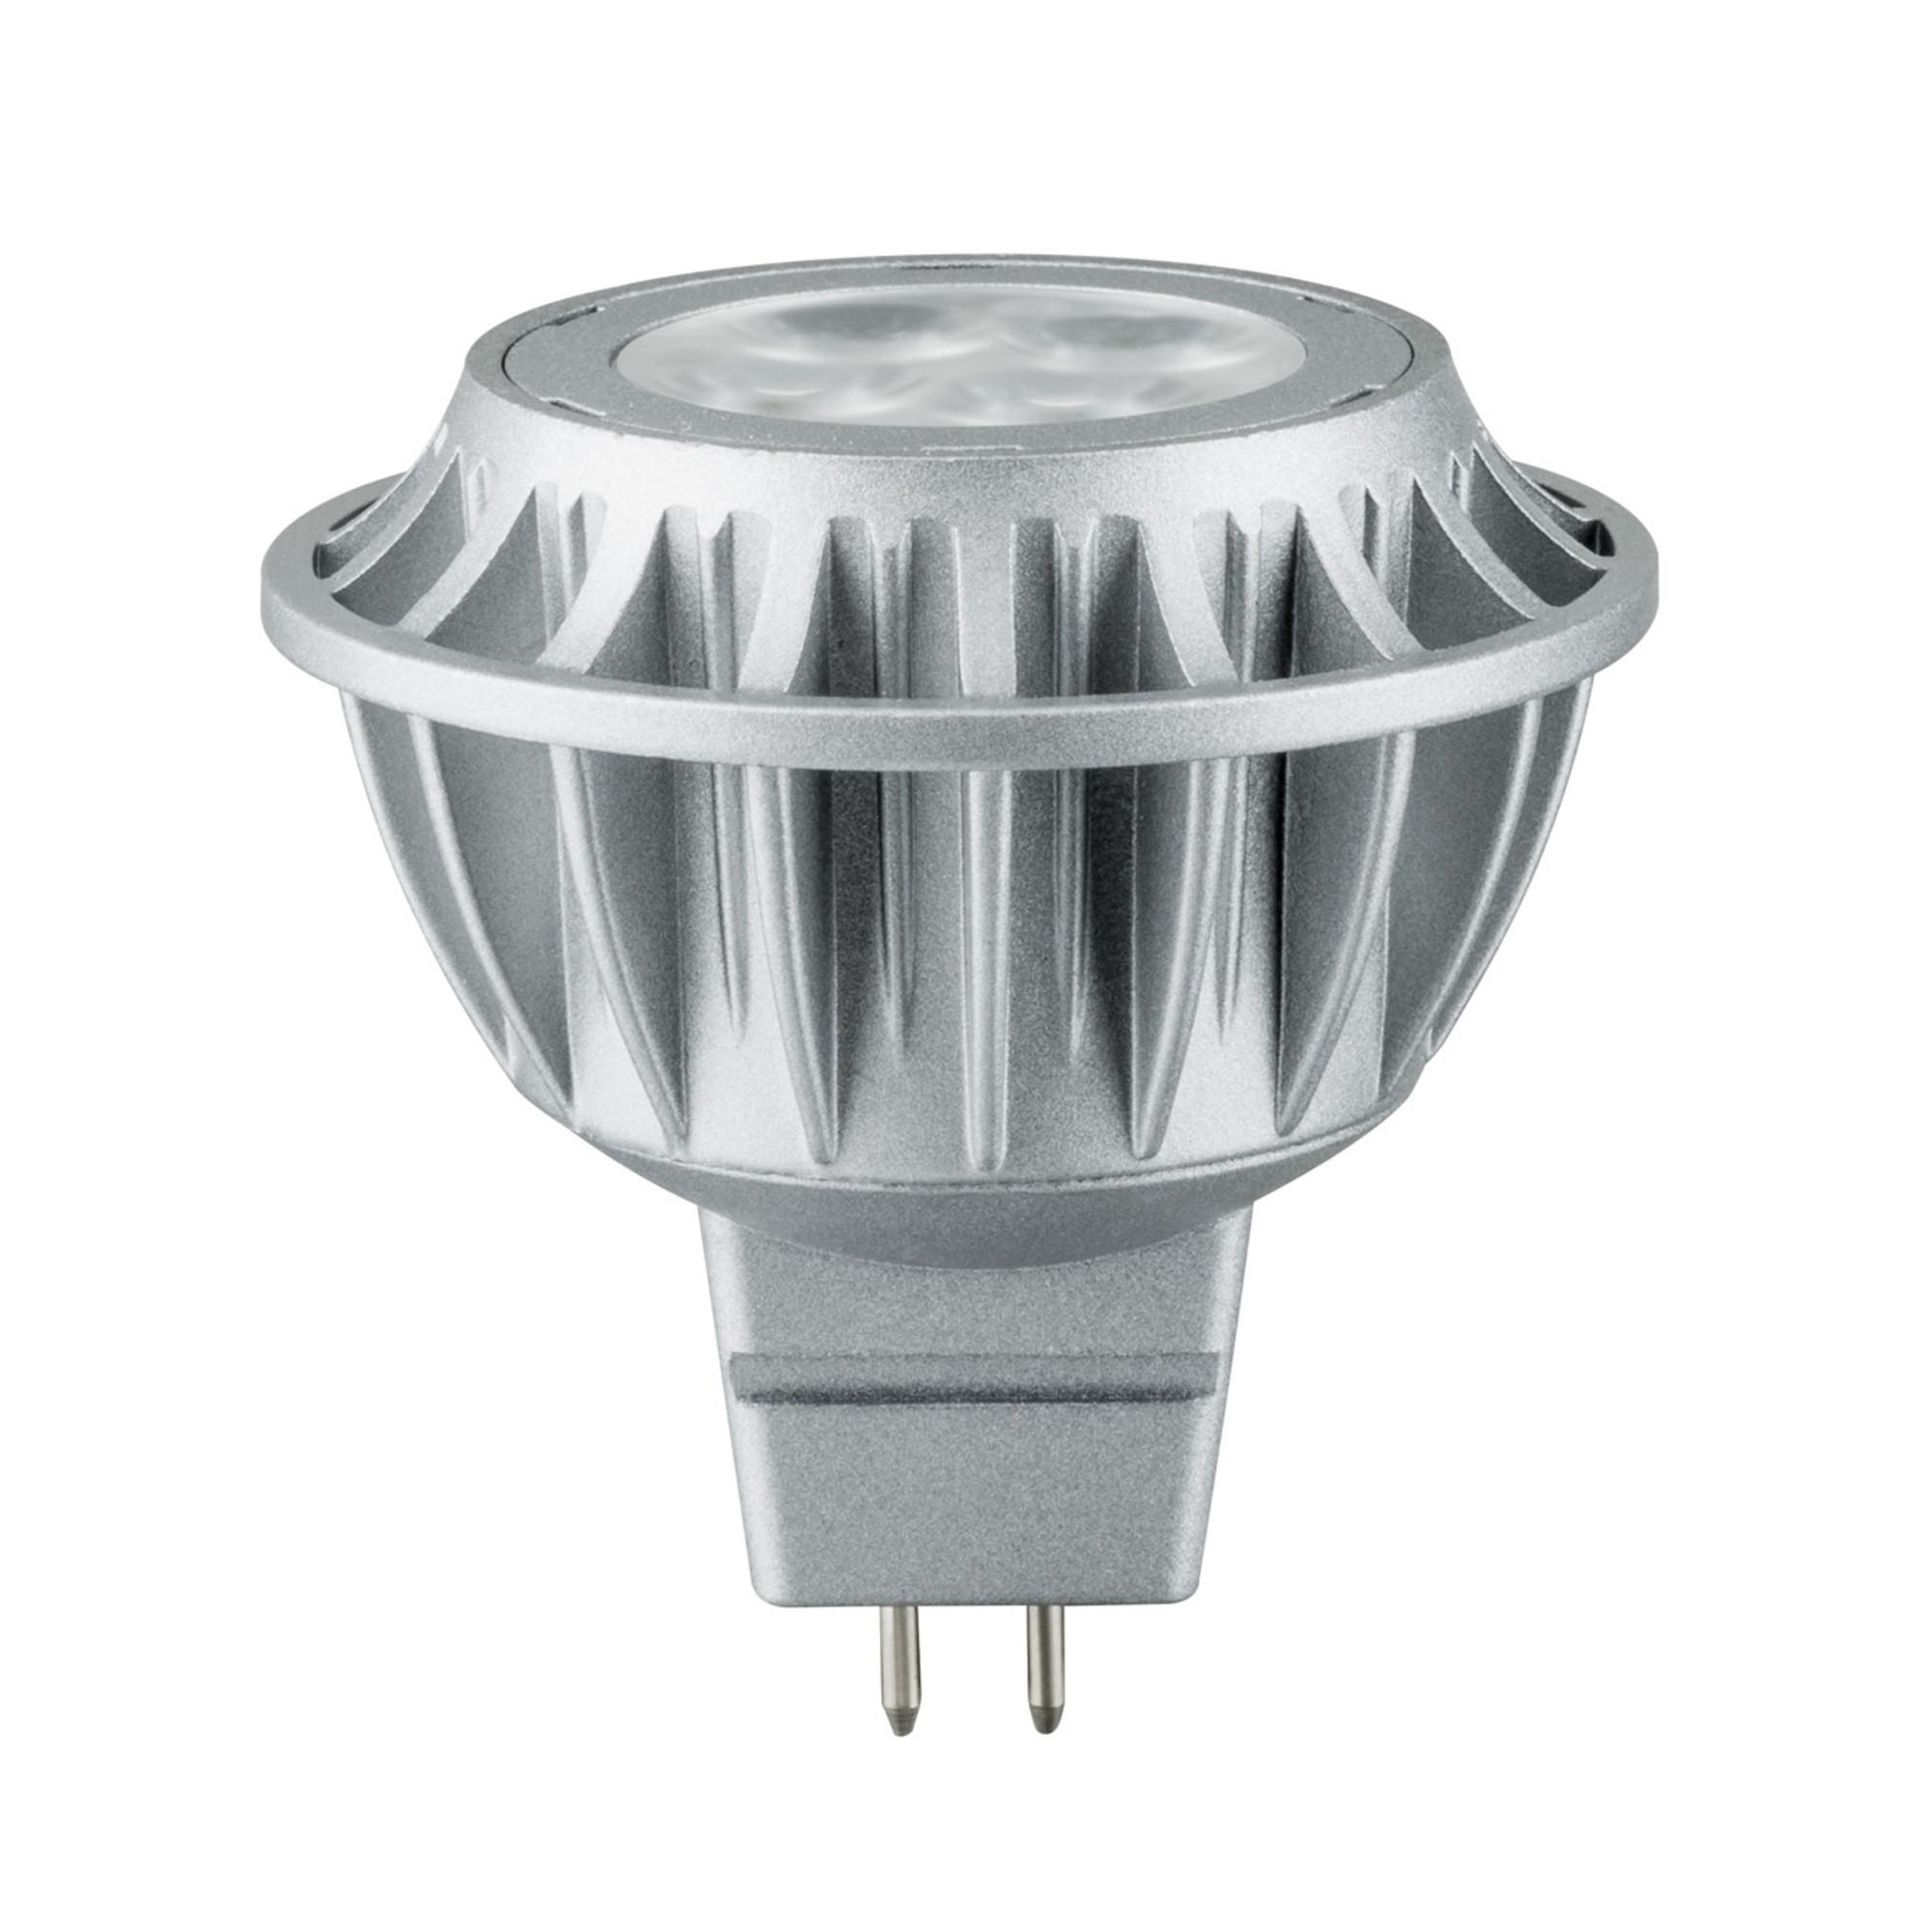 Лампа светодиодная Paulmann 28236 GU5.3 220 Лм теплый свет